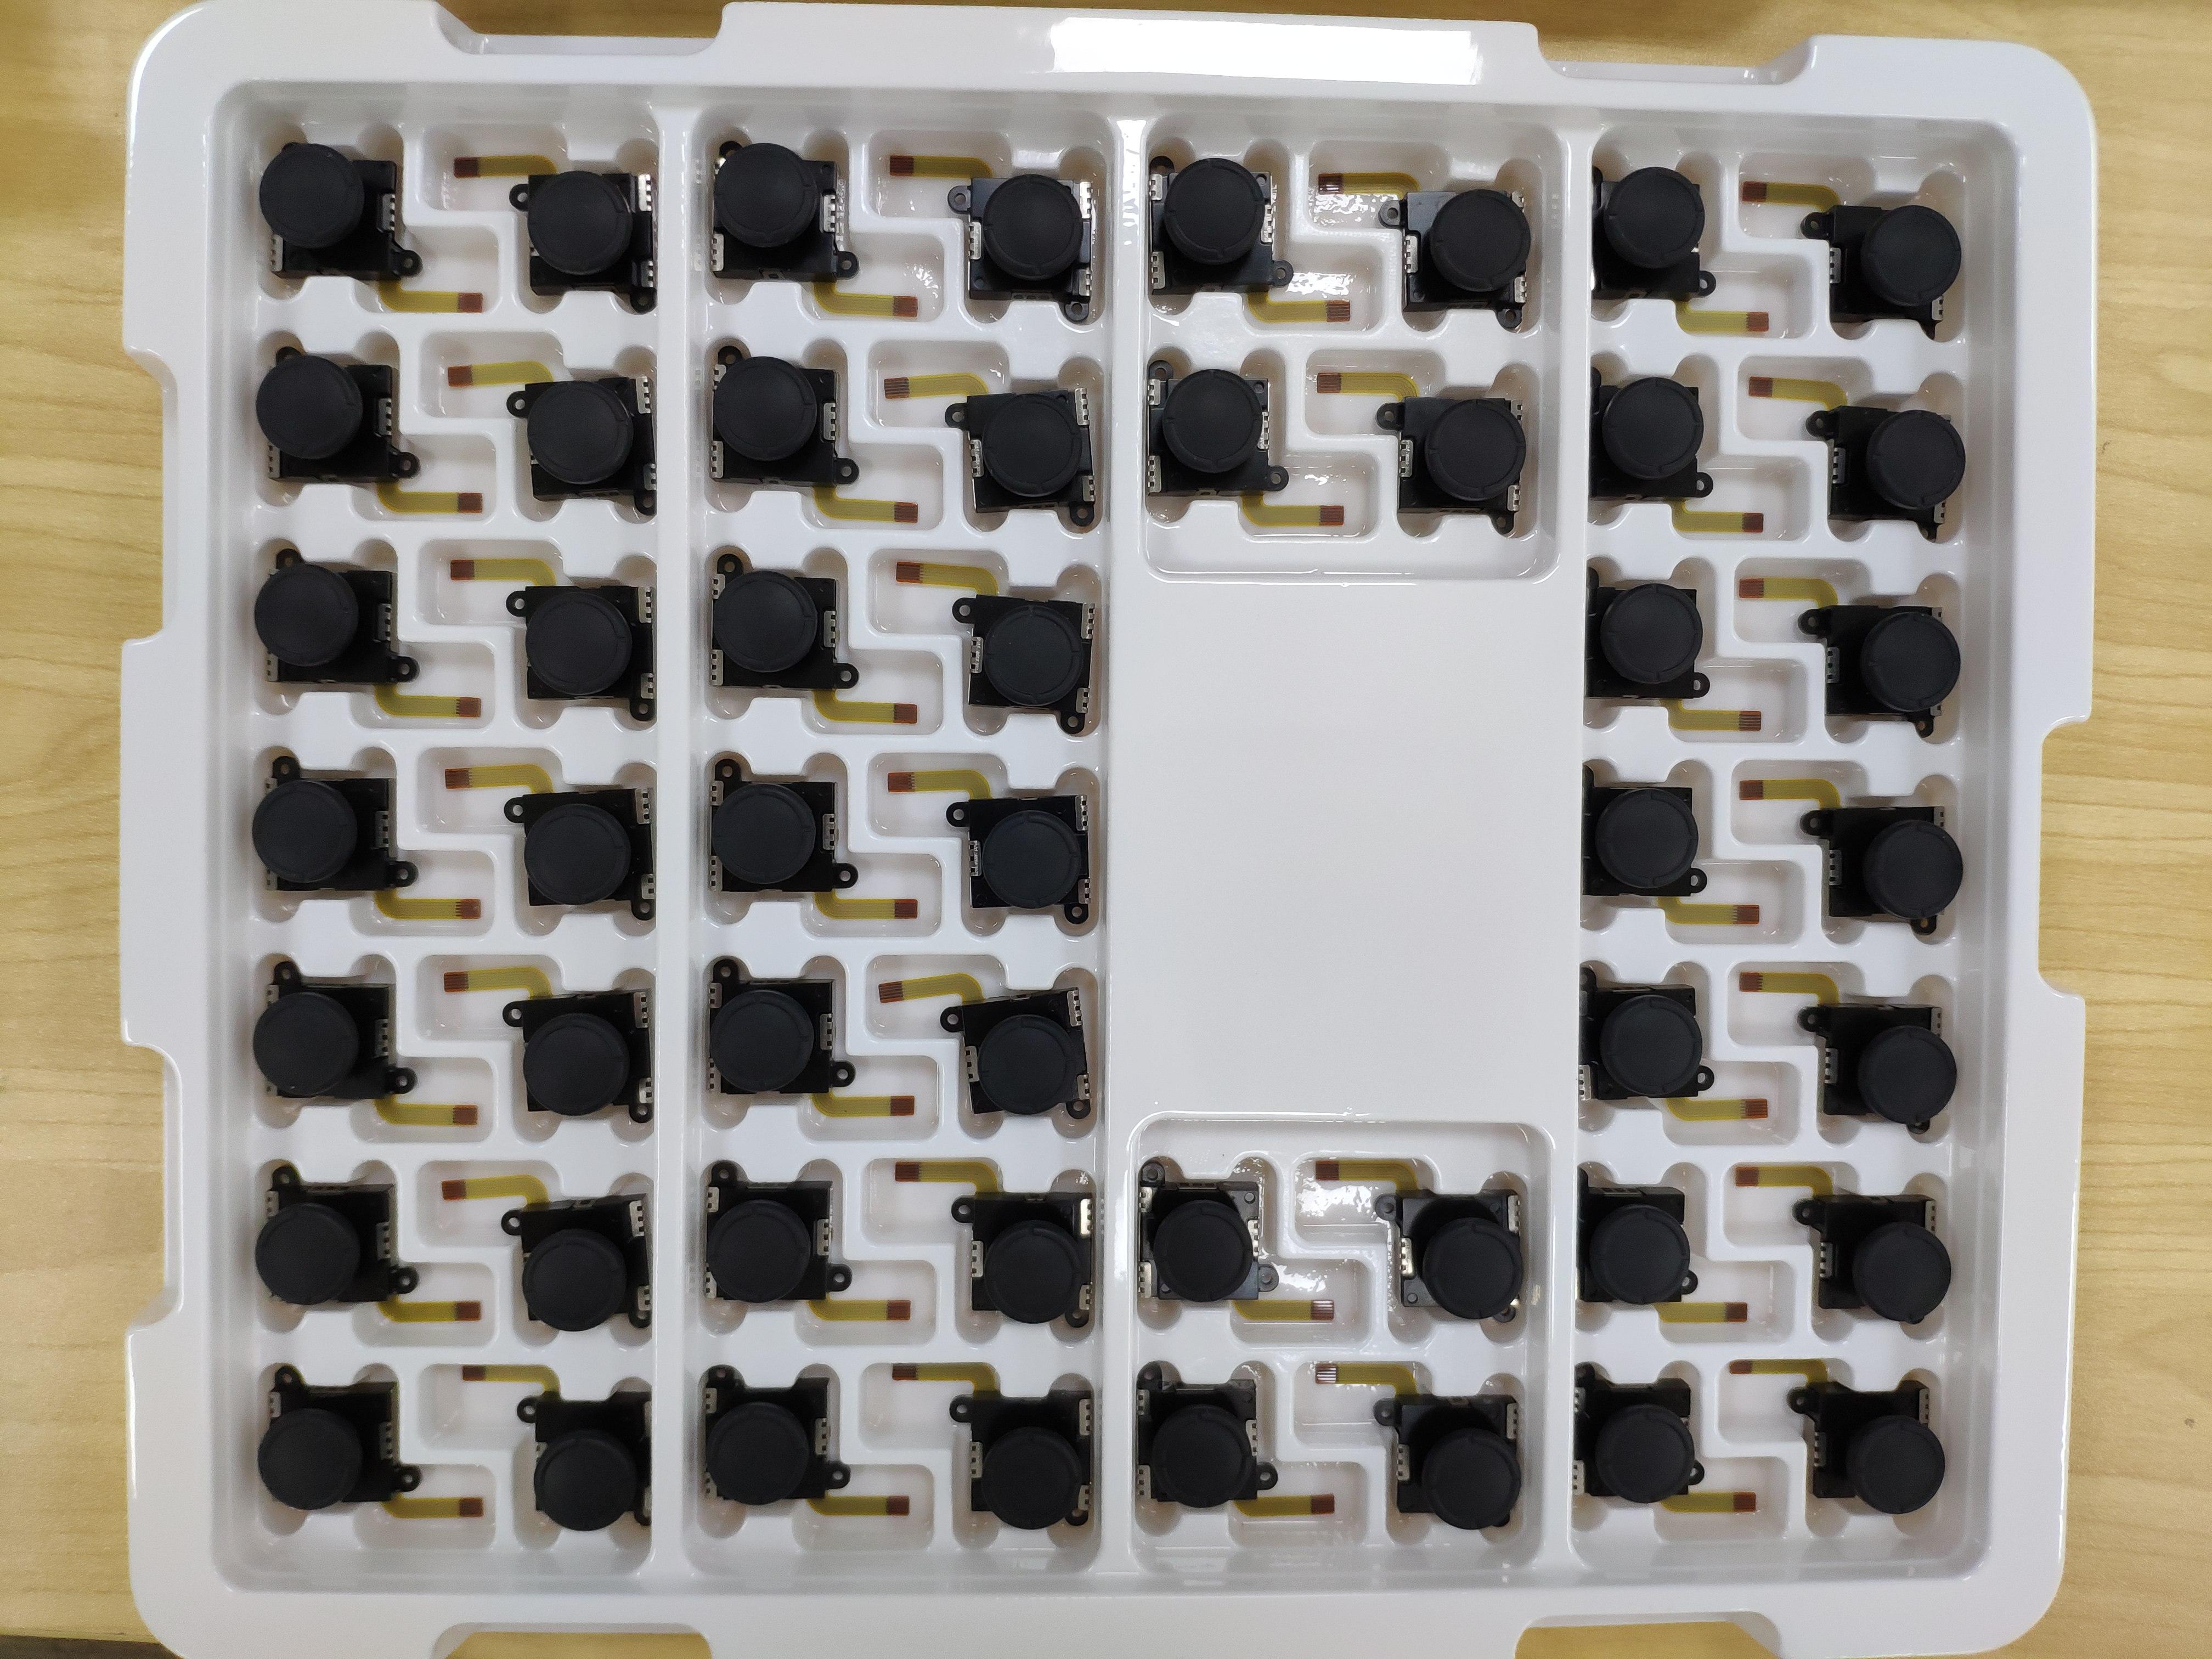 100PCS Lot High Quality New For Nintend Switch NS Joy Con Controller 3D Analog Joystick Thumb